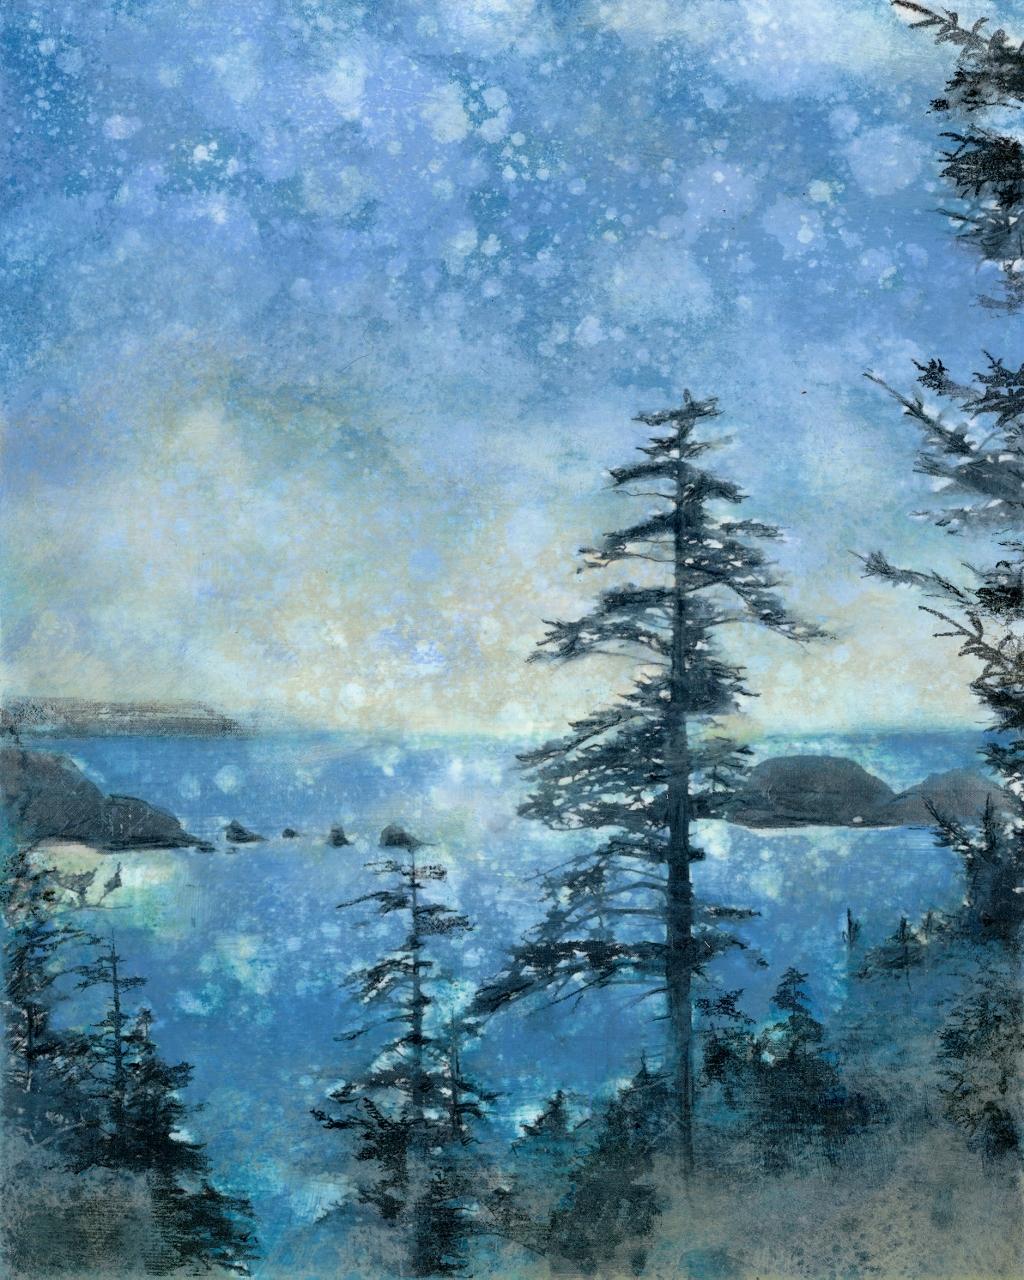 Spring Vista, Rain Painting Print, Jeni Lee, Cape Meares, Three Arch Rocks LARGE MASTER (1024x1280).jpg